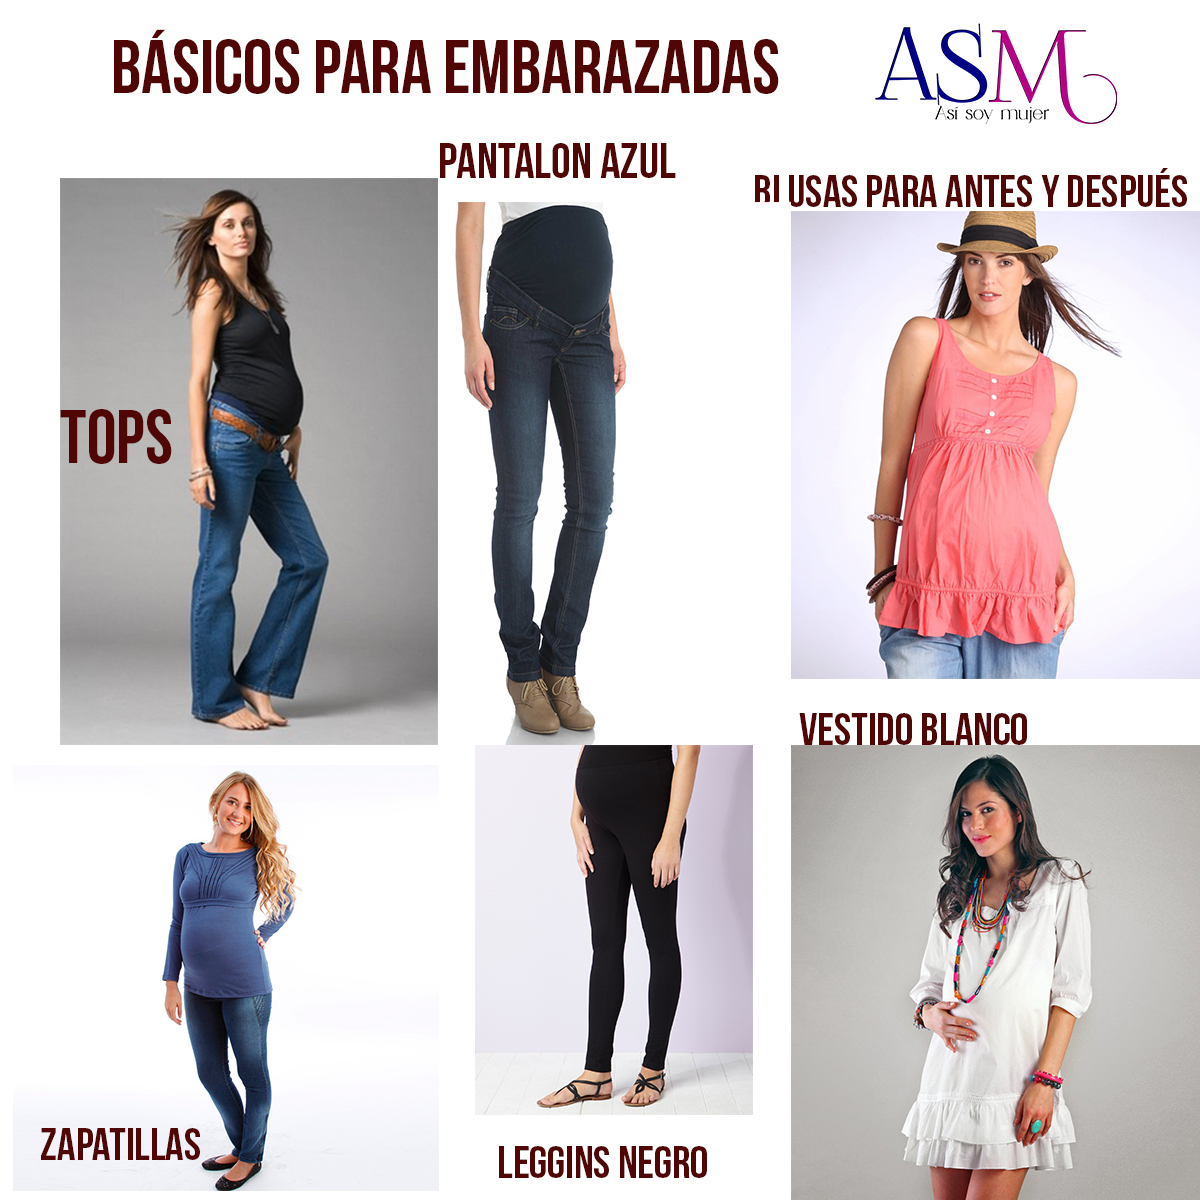 722b7636e Repercusiones de la ropa ajustada en el embarazo - Asi Soy Mujer ...